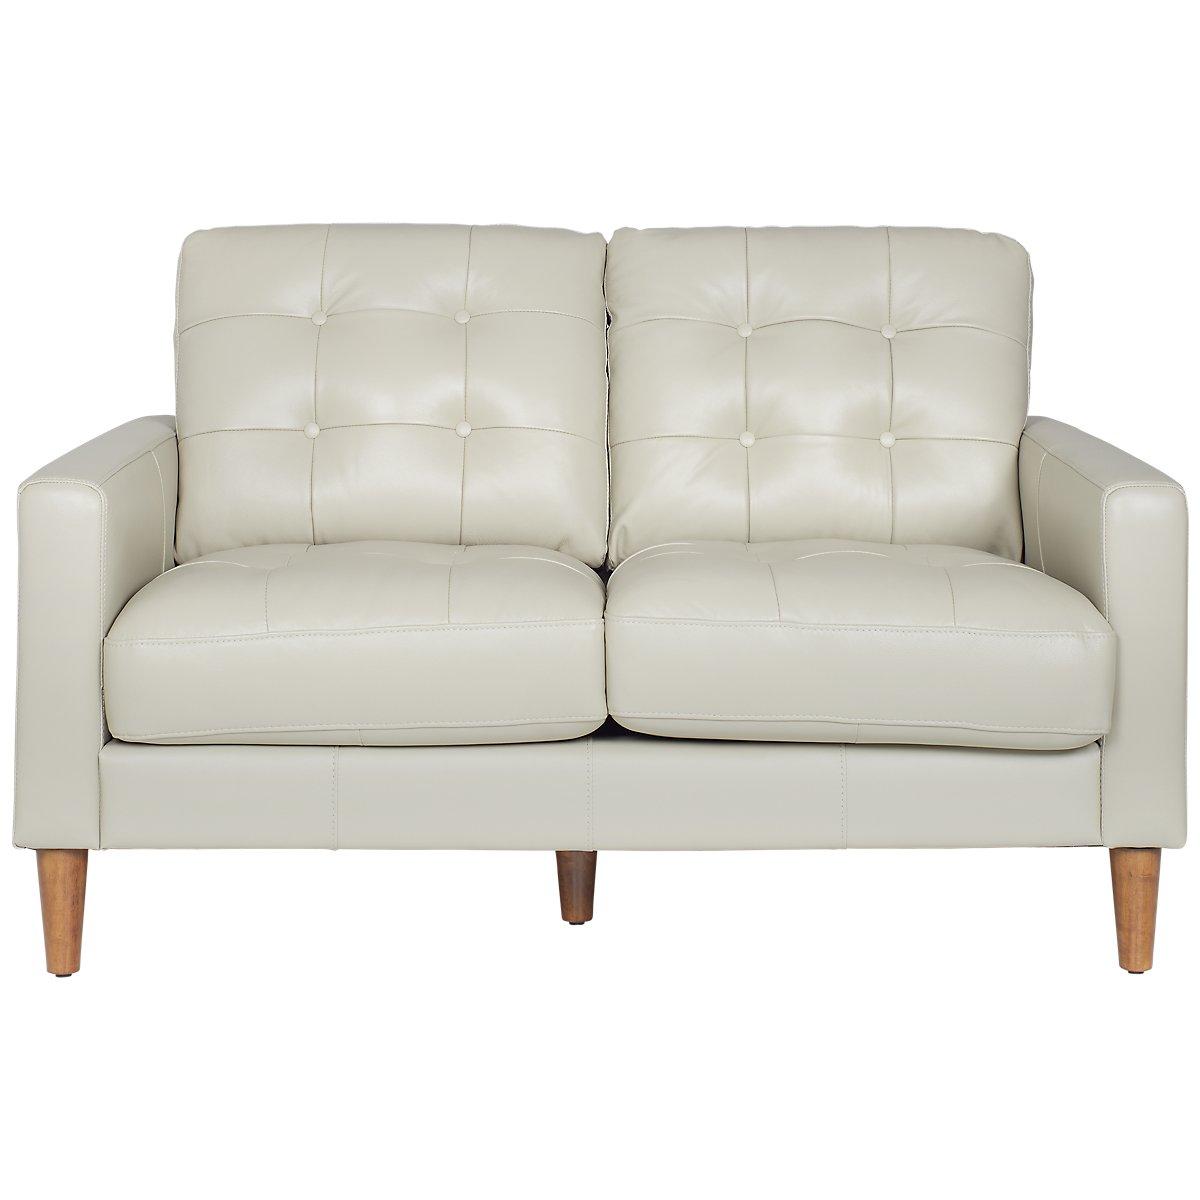 Finley Gray Leather & Vinyl Loveseat | Living Room - Loveseats | City Furniture